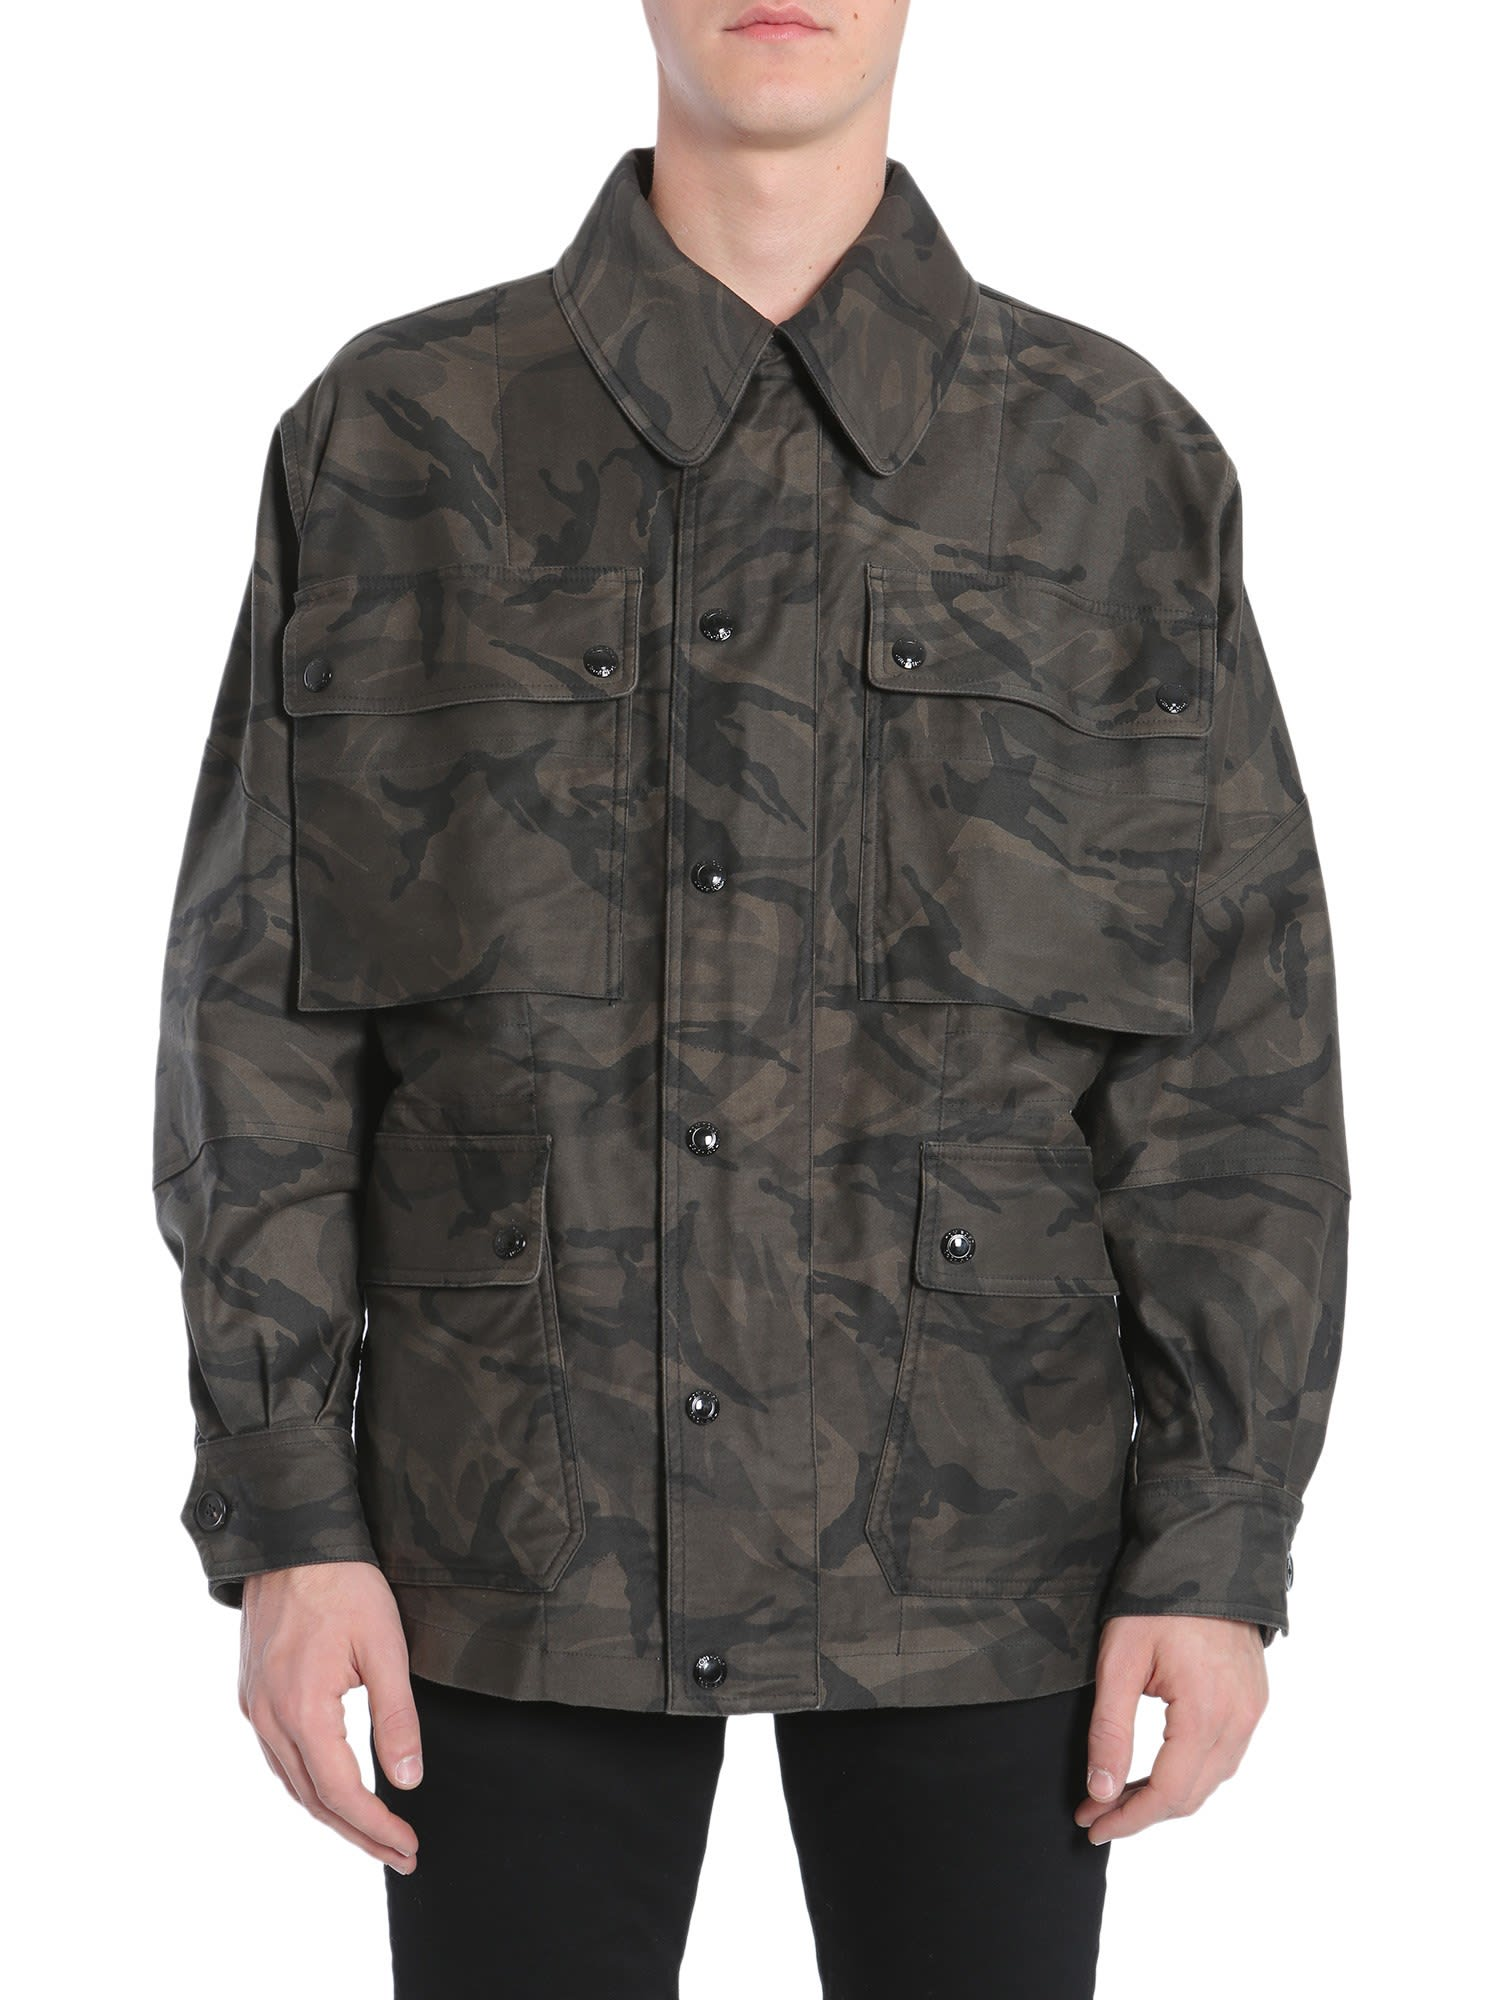 1e6ae1237fa8c Tom Ford Tom Ford Camouflage Jacket - MILITARE - 10728119   italist